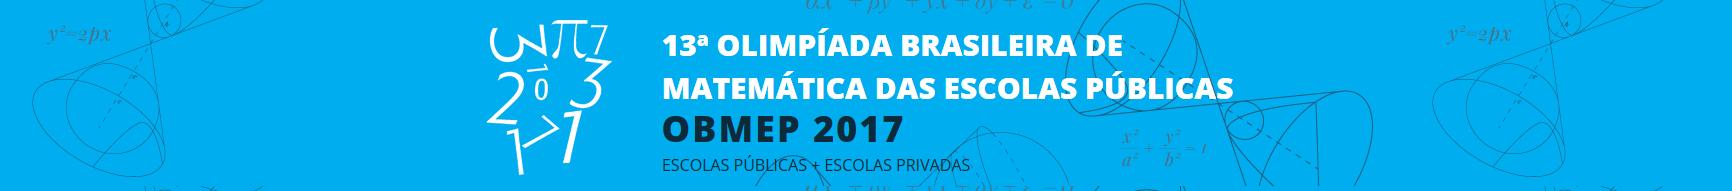 obmep-2017